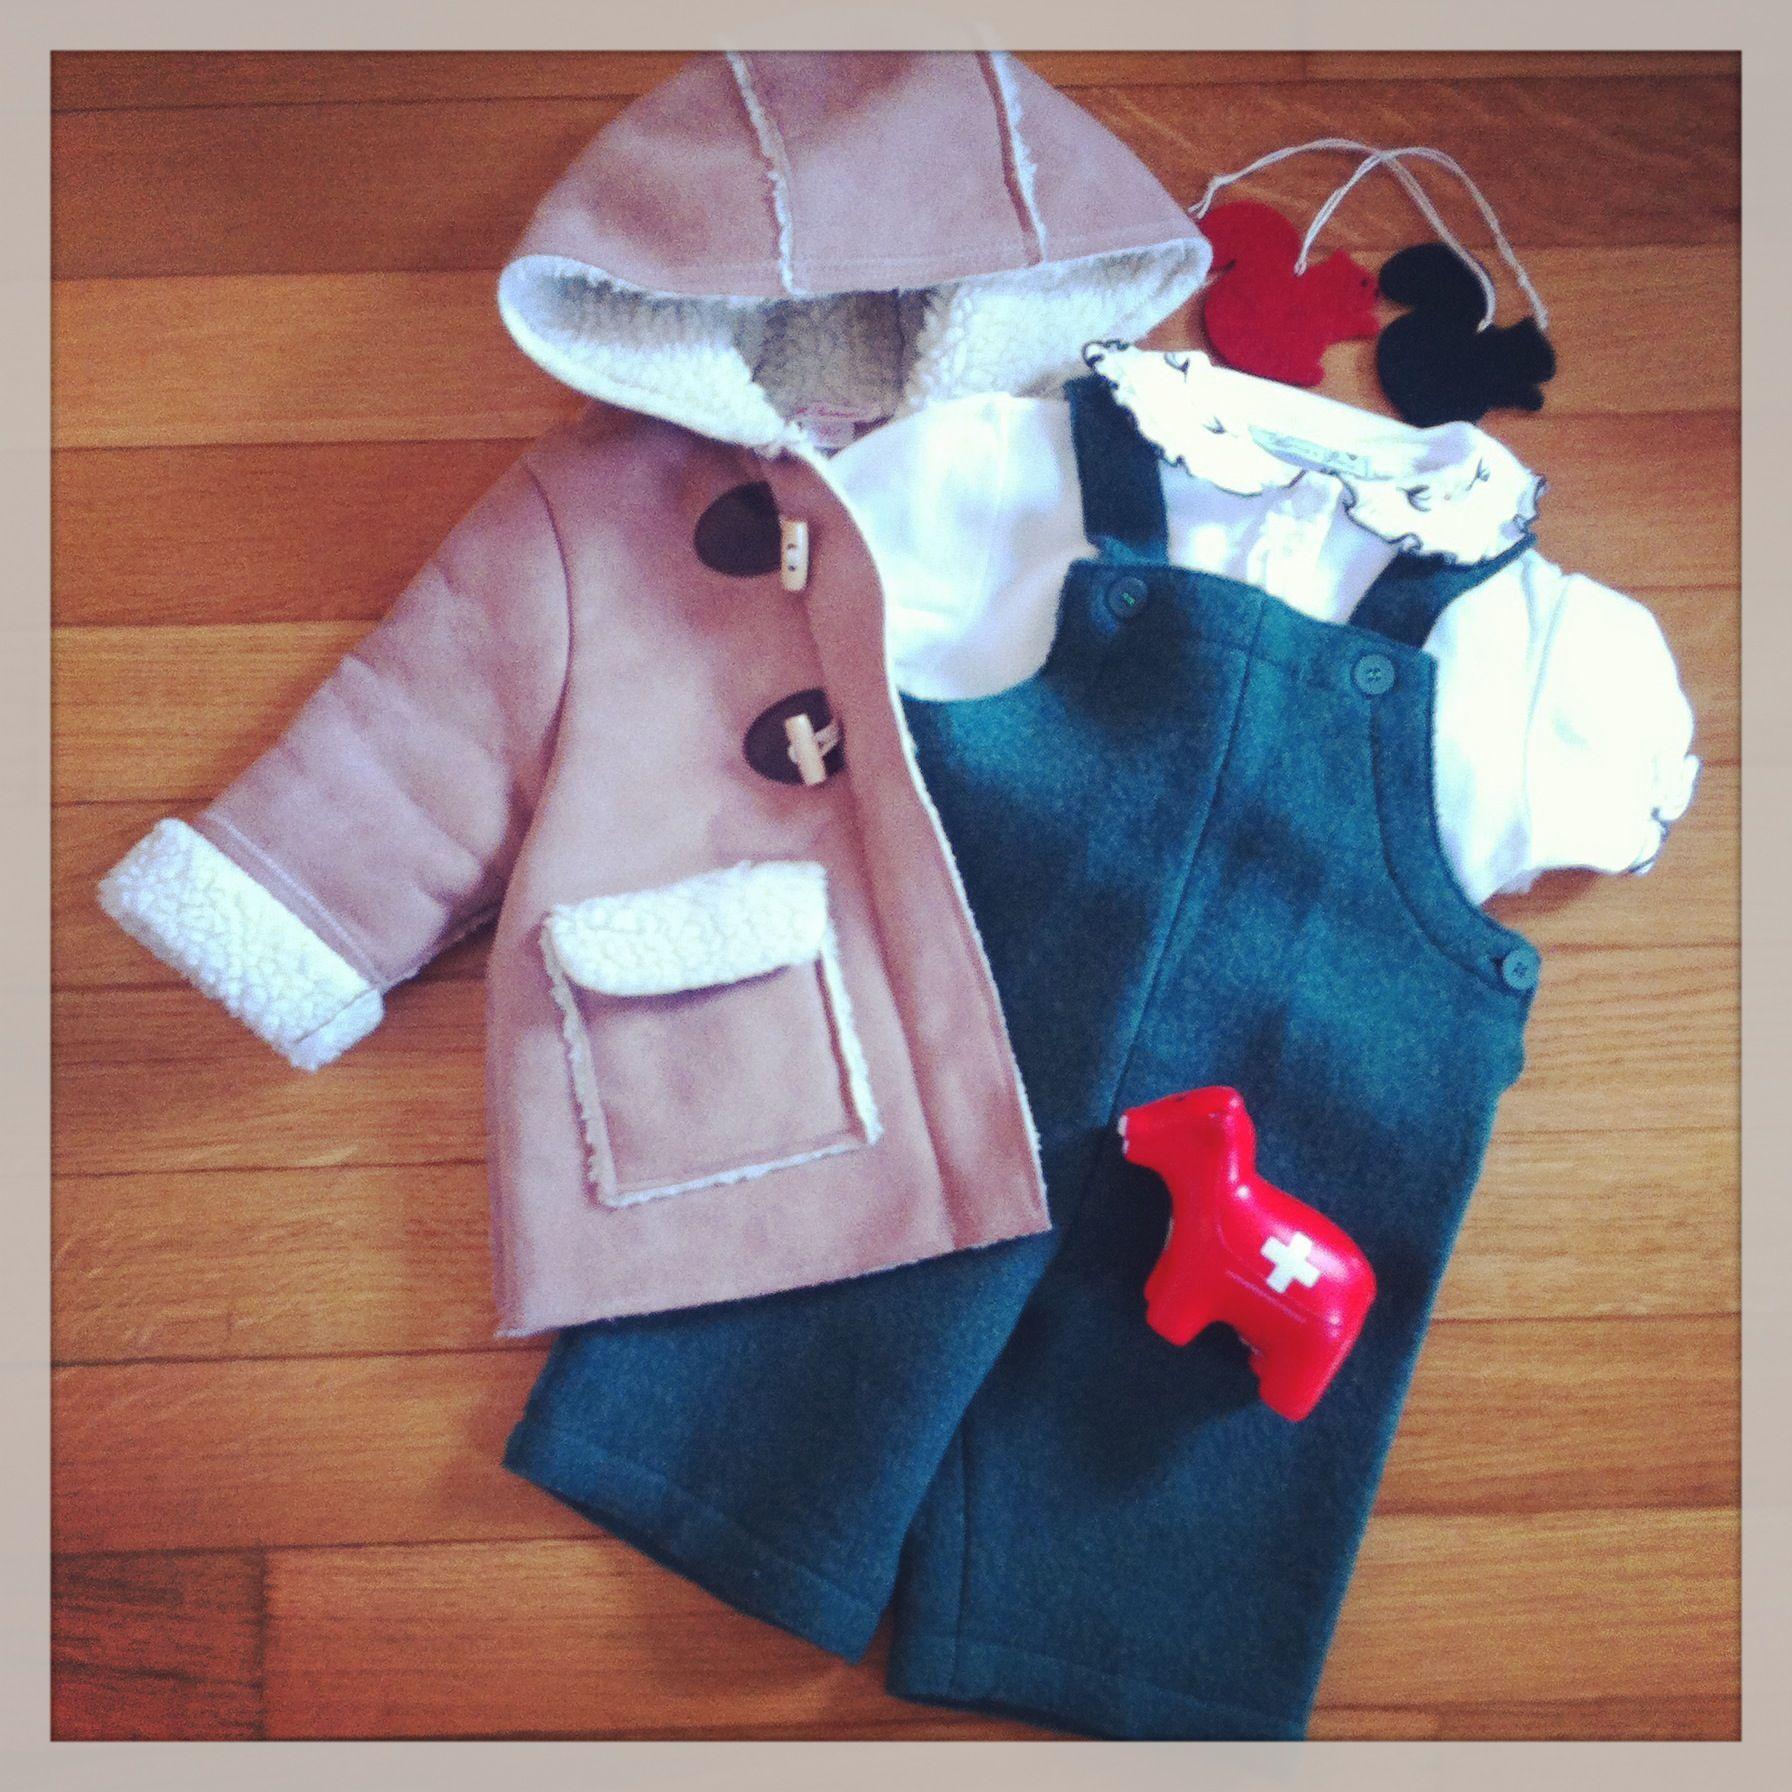 mafrat junior collection kids clothes ferrari en